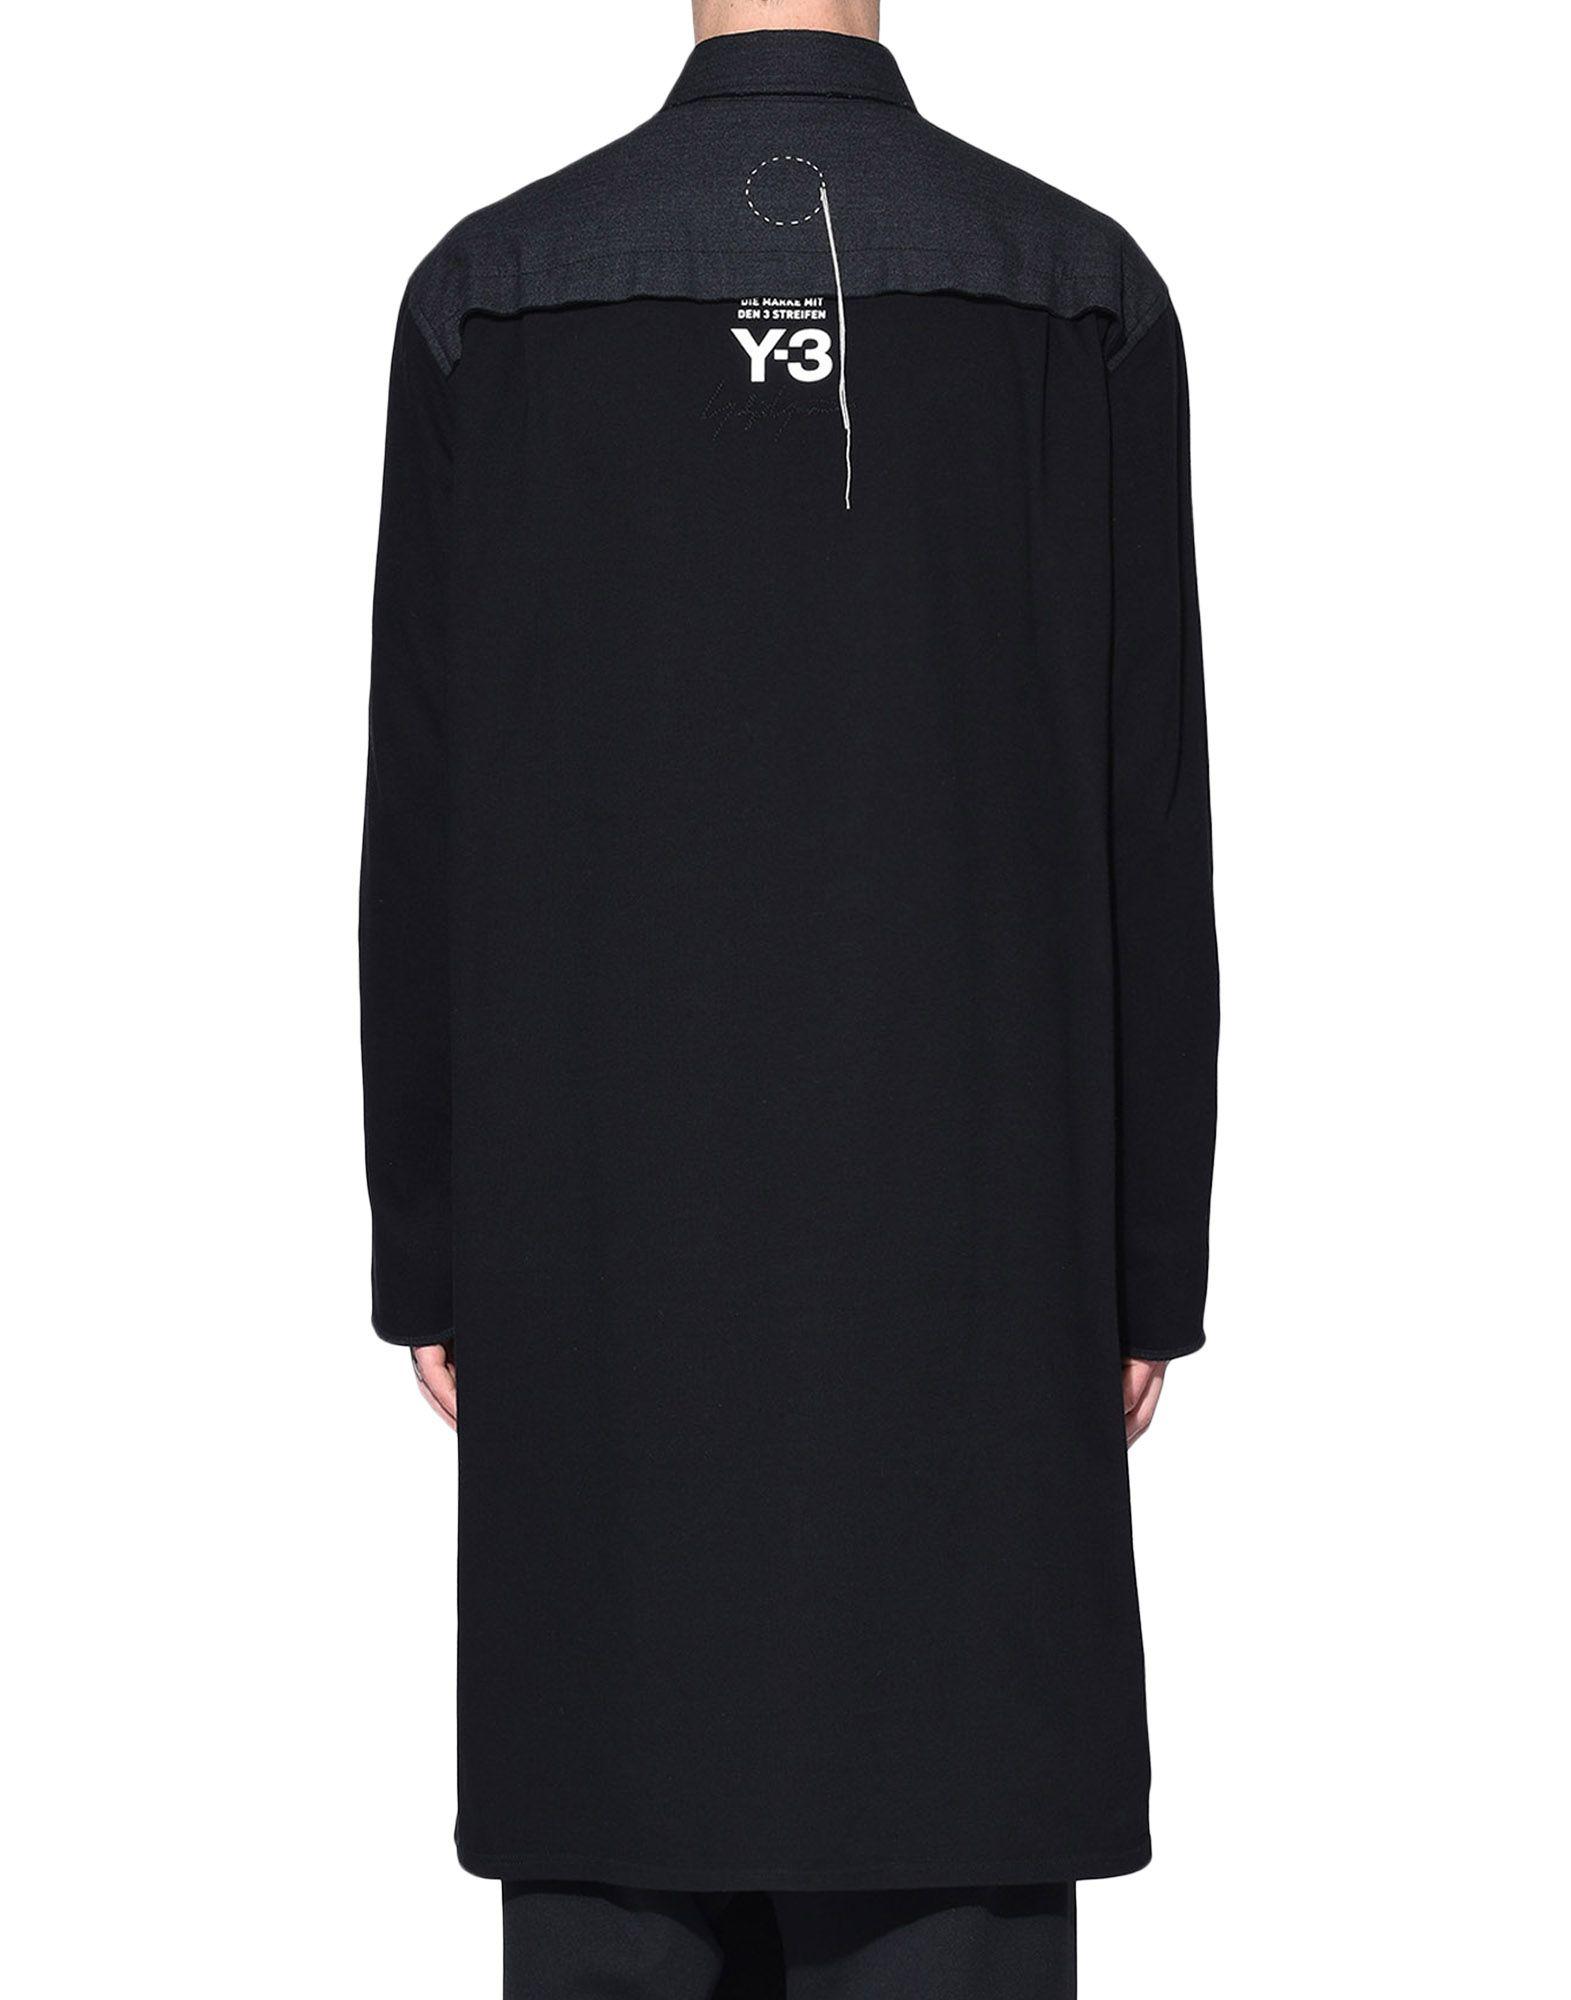 Y-3 Y-3 Herringbone Long Shirt Long sleeve shirt Man d